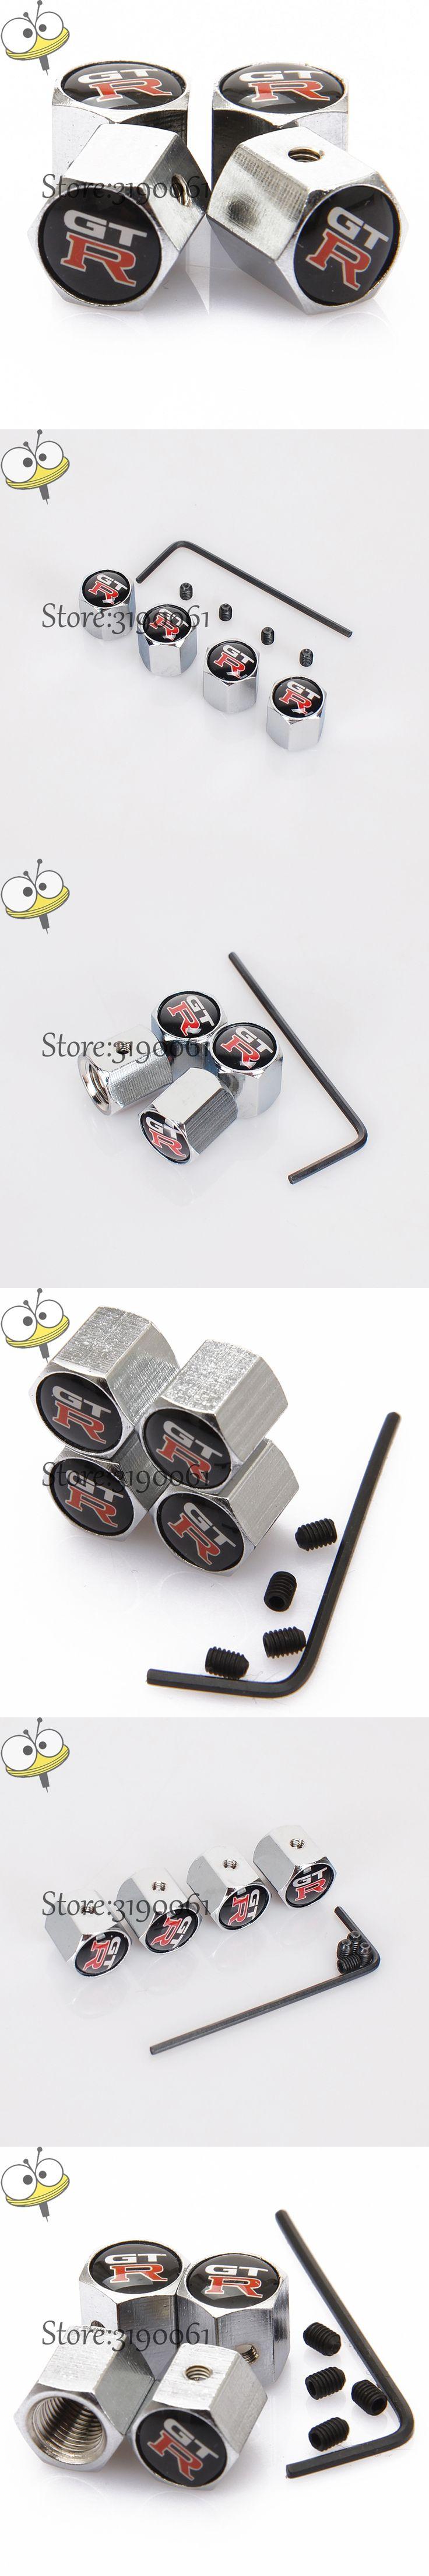 Car Styling Wheel Tire Valve Stem Caps Rim Sticker For GTR Logo For Nissan Tiida Teana Maxima Xterra Frontier Juke Note 350-z